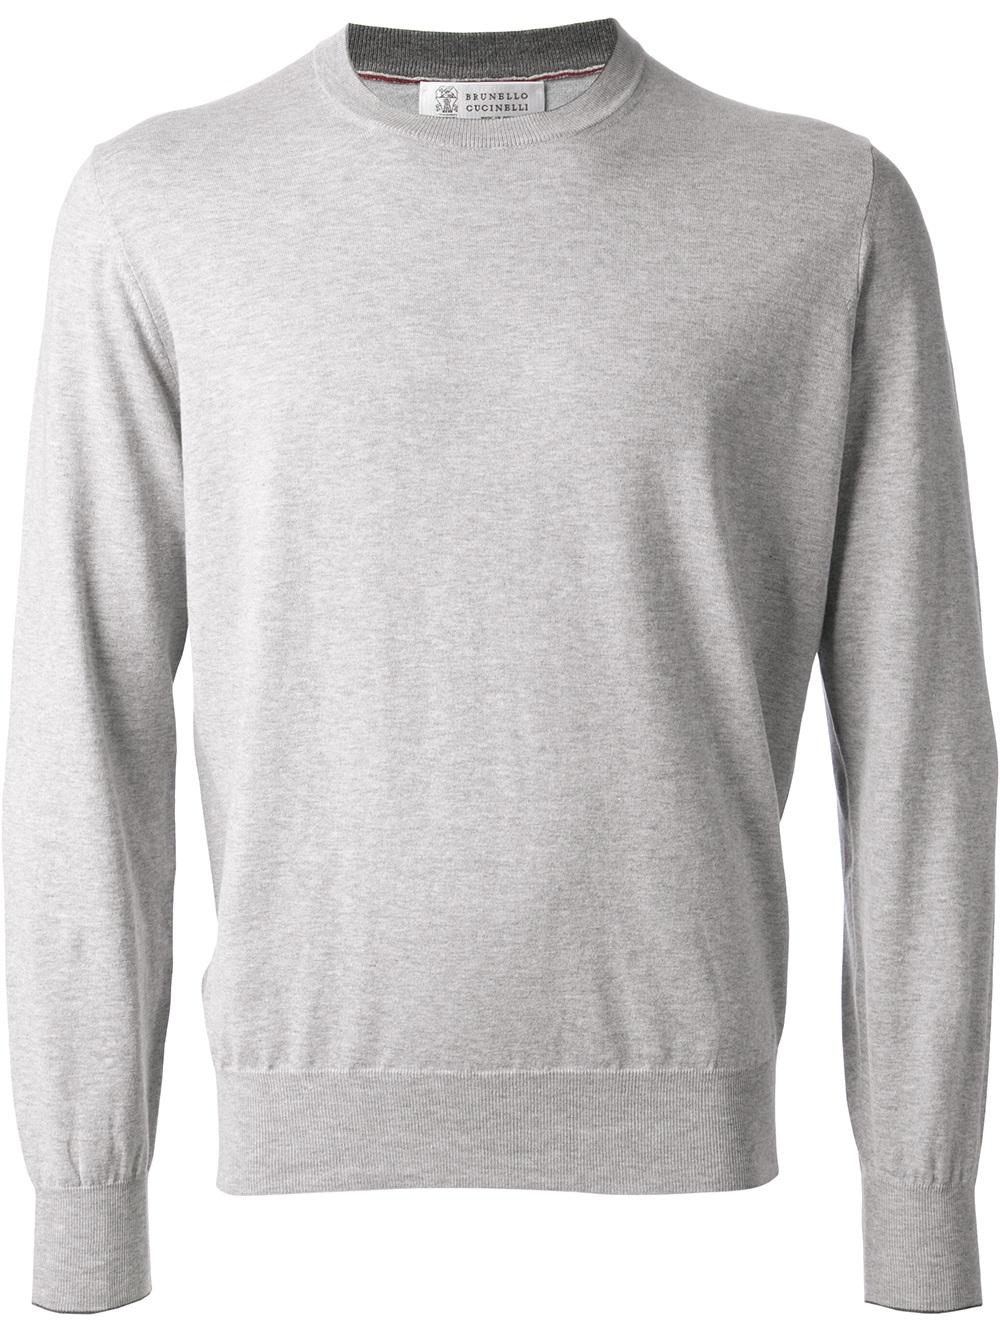 Brunello cucinelli Plain Sweater in Gray for Men | Lyst